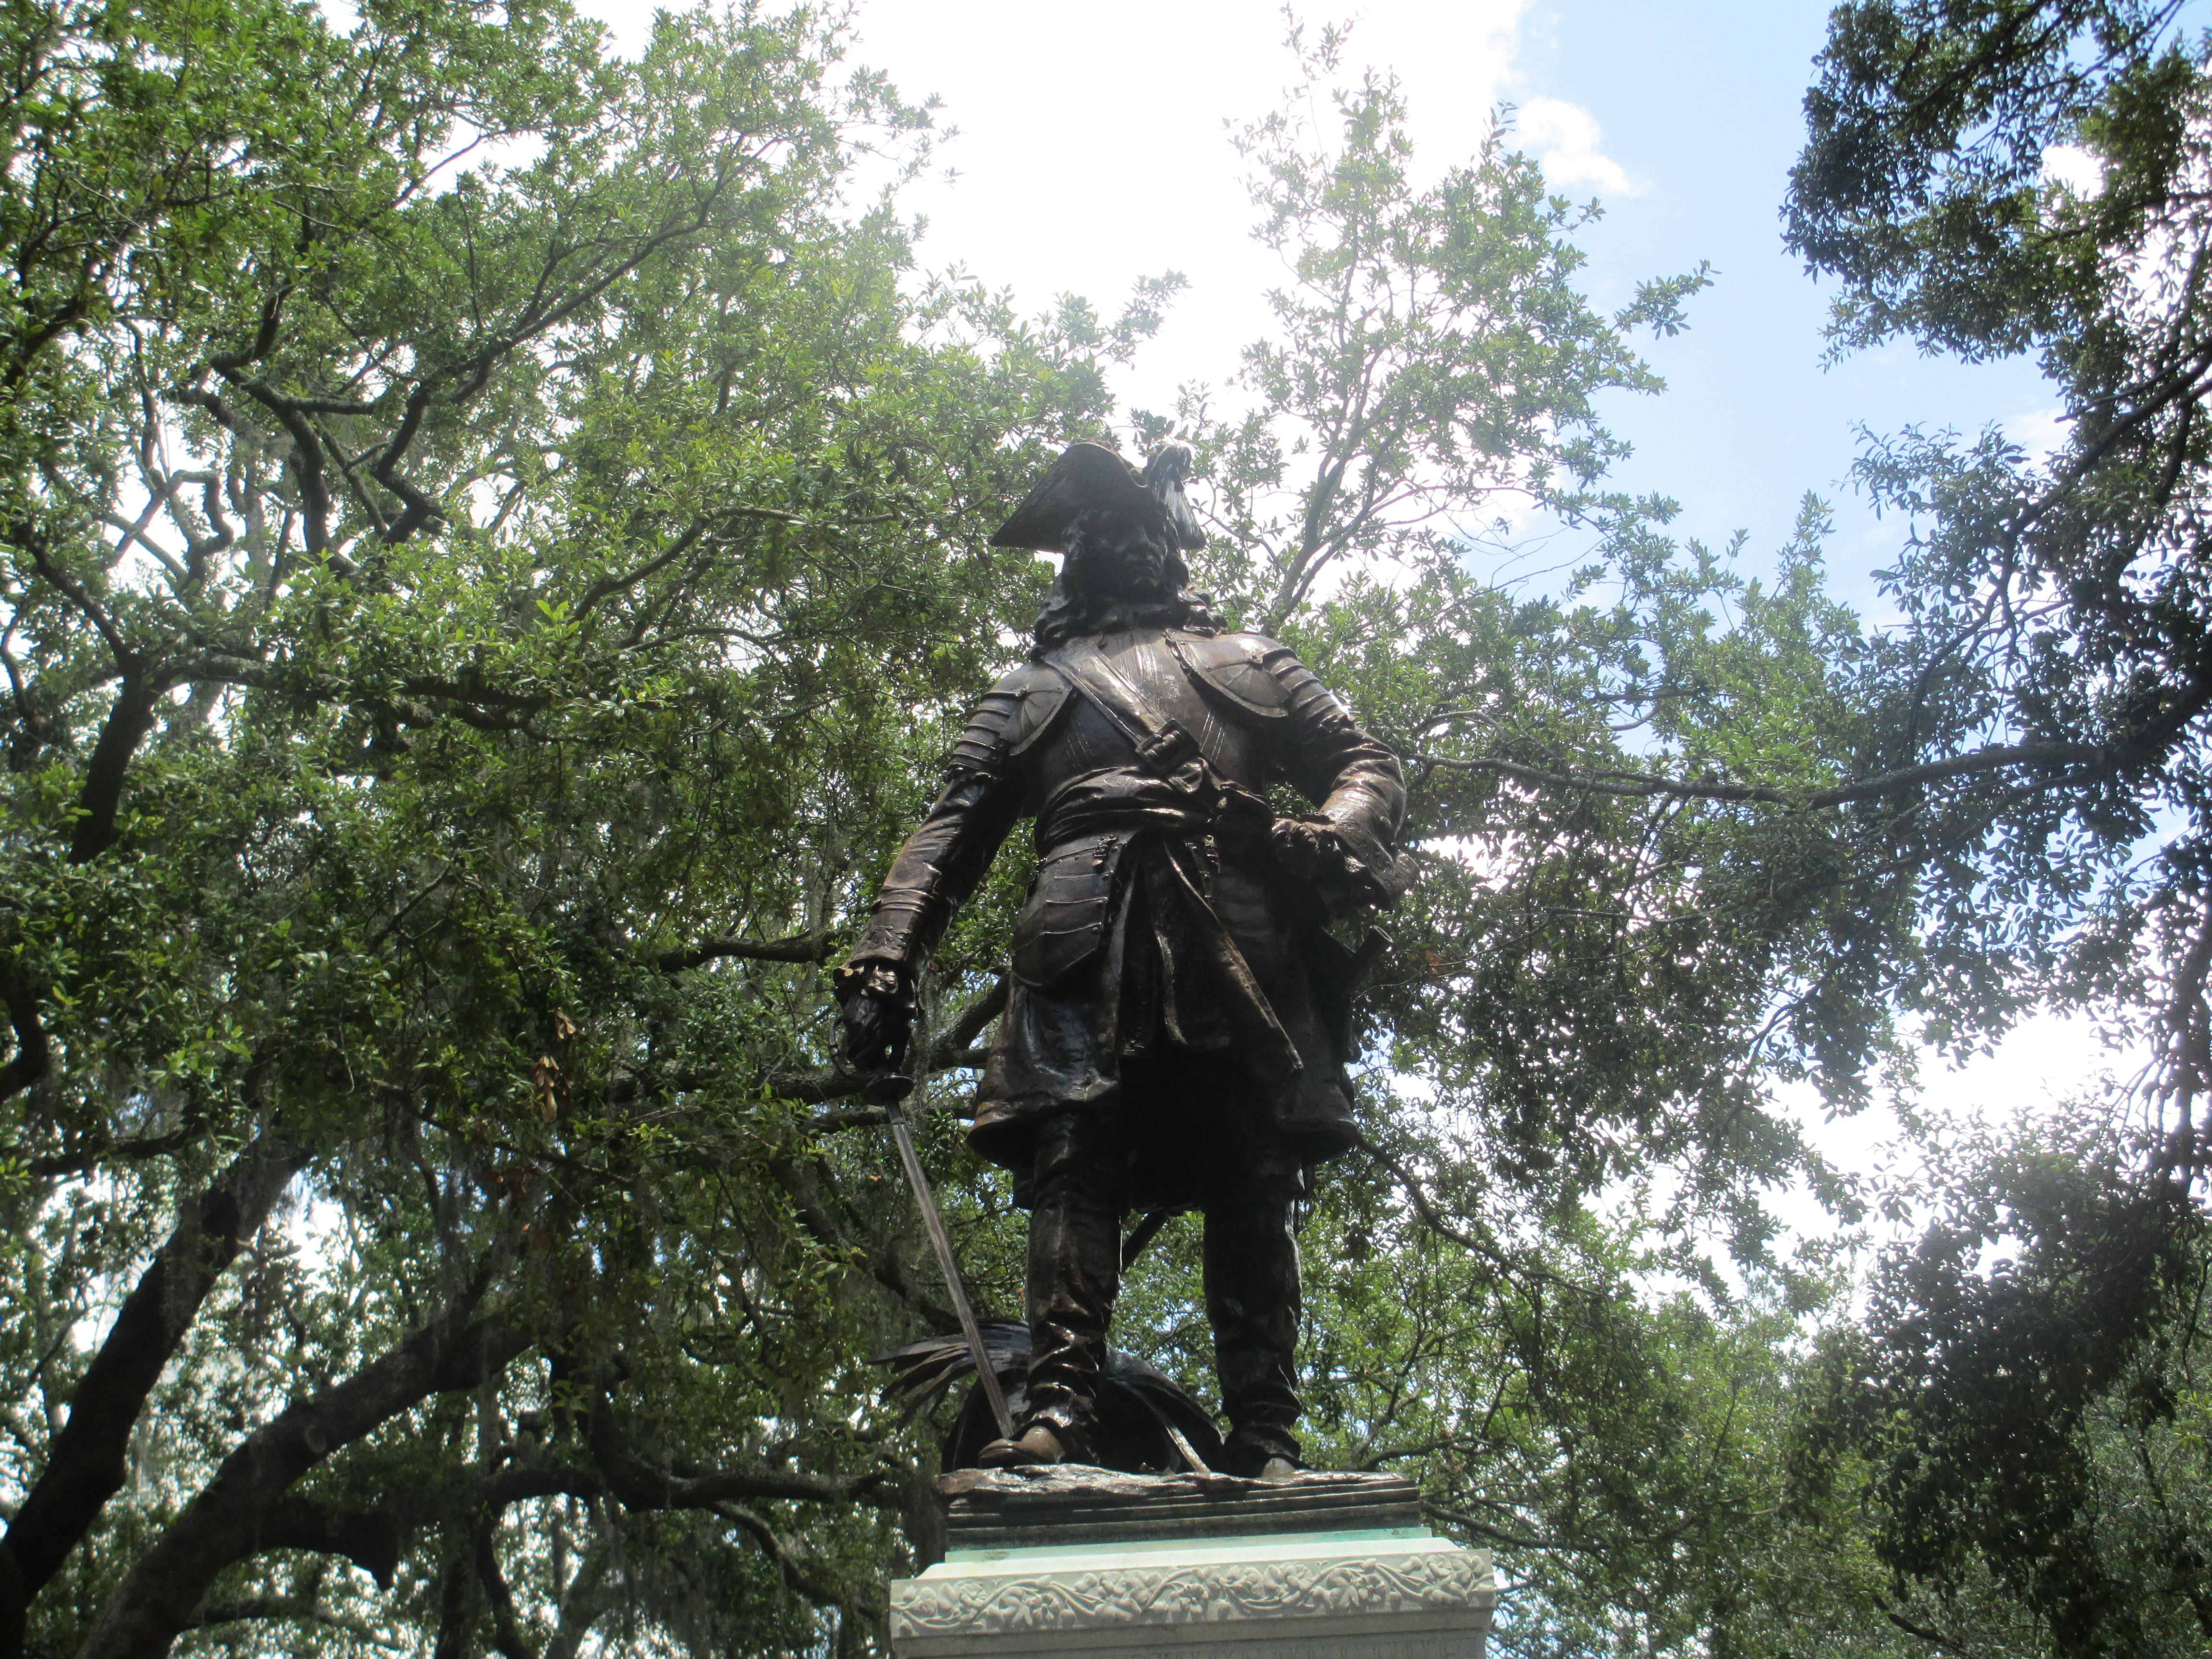 Photo of James Oglethorpe in Savannah, Georgia. Photo taken on June 18, 2012.